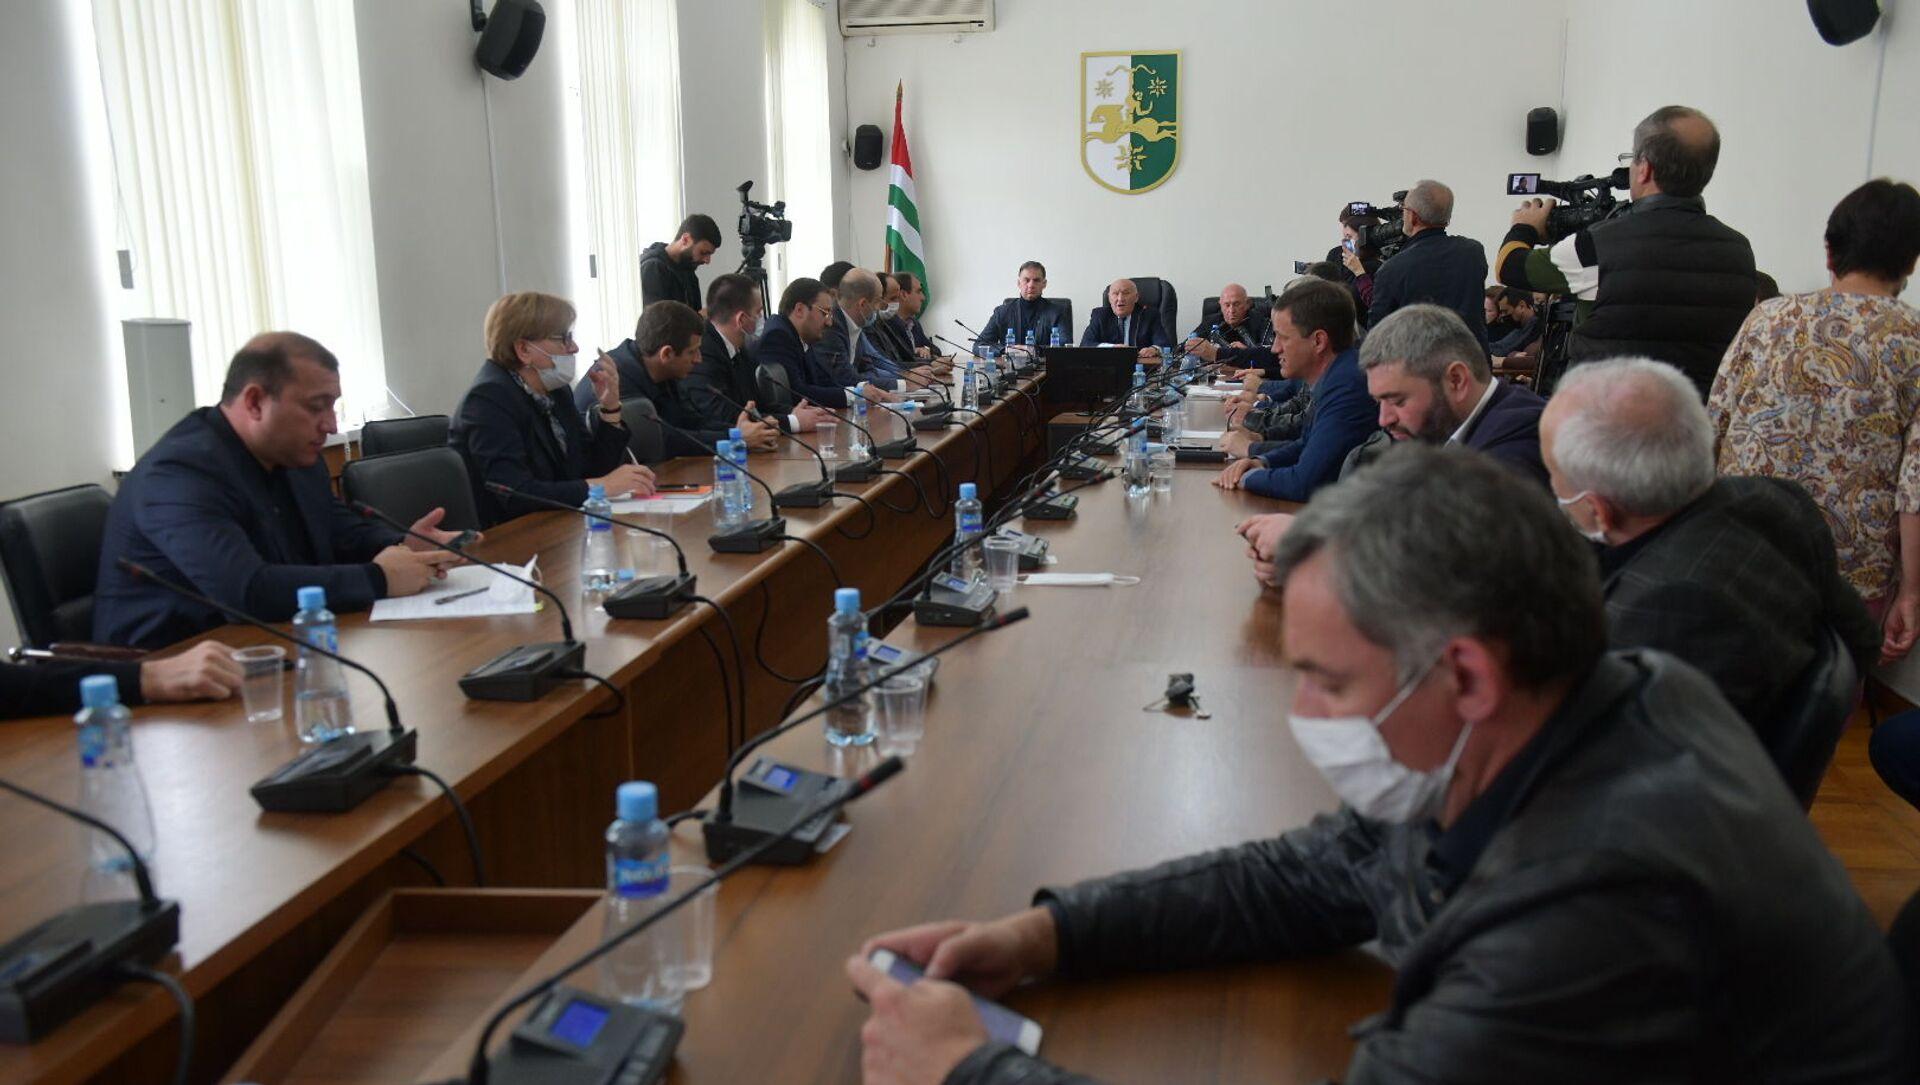 Заседание парламента  - Sputnik Абхазия, 1920, 04.10.2021